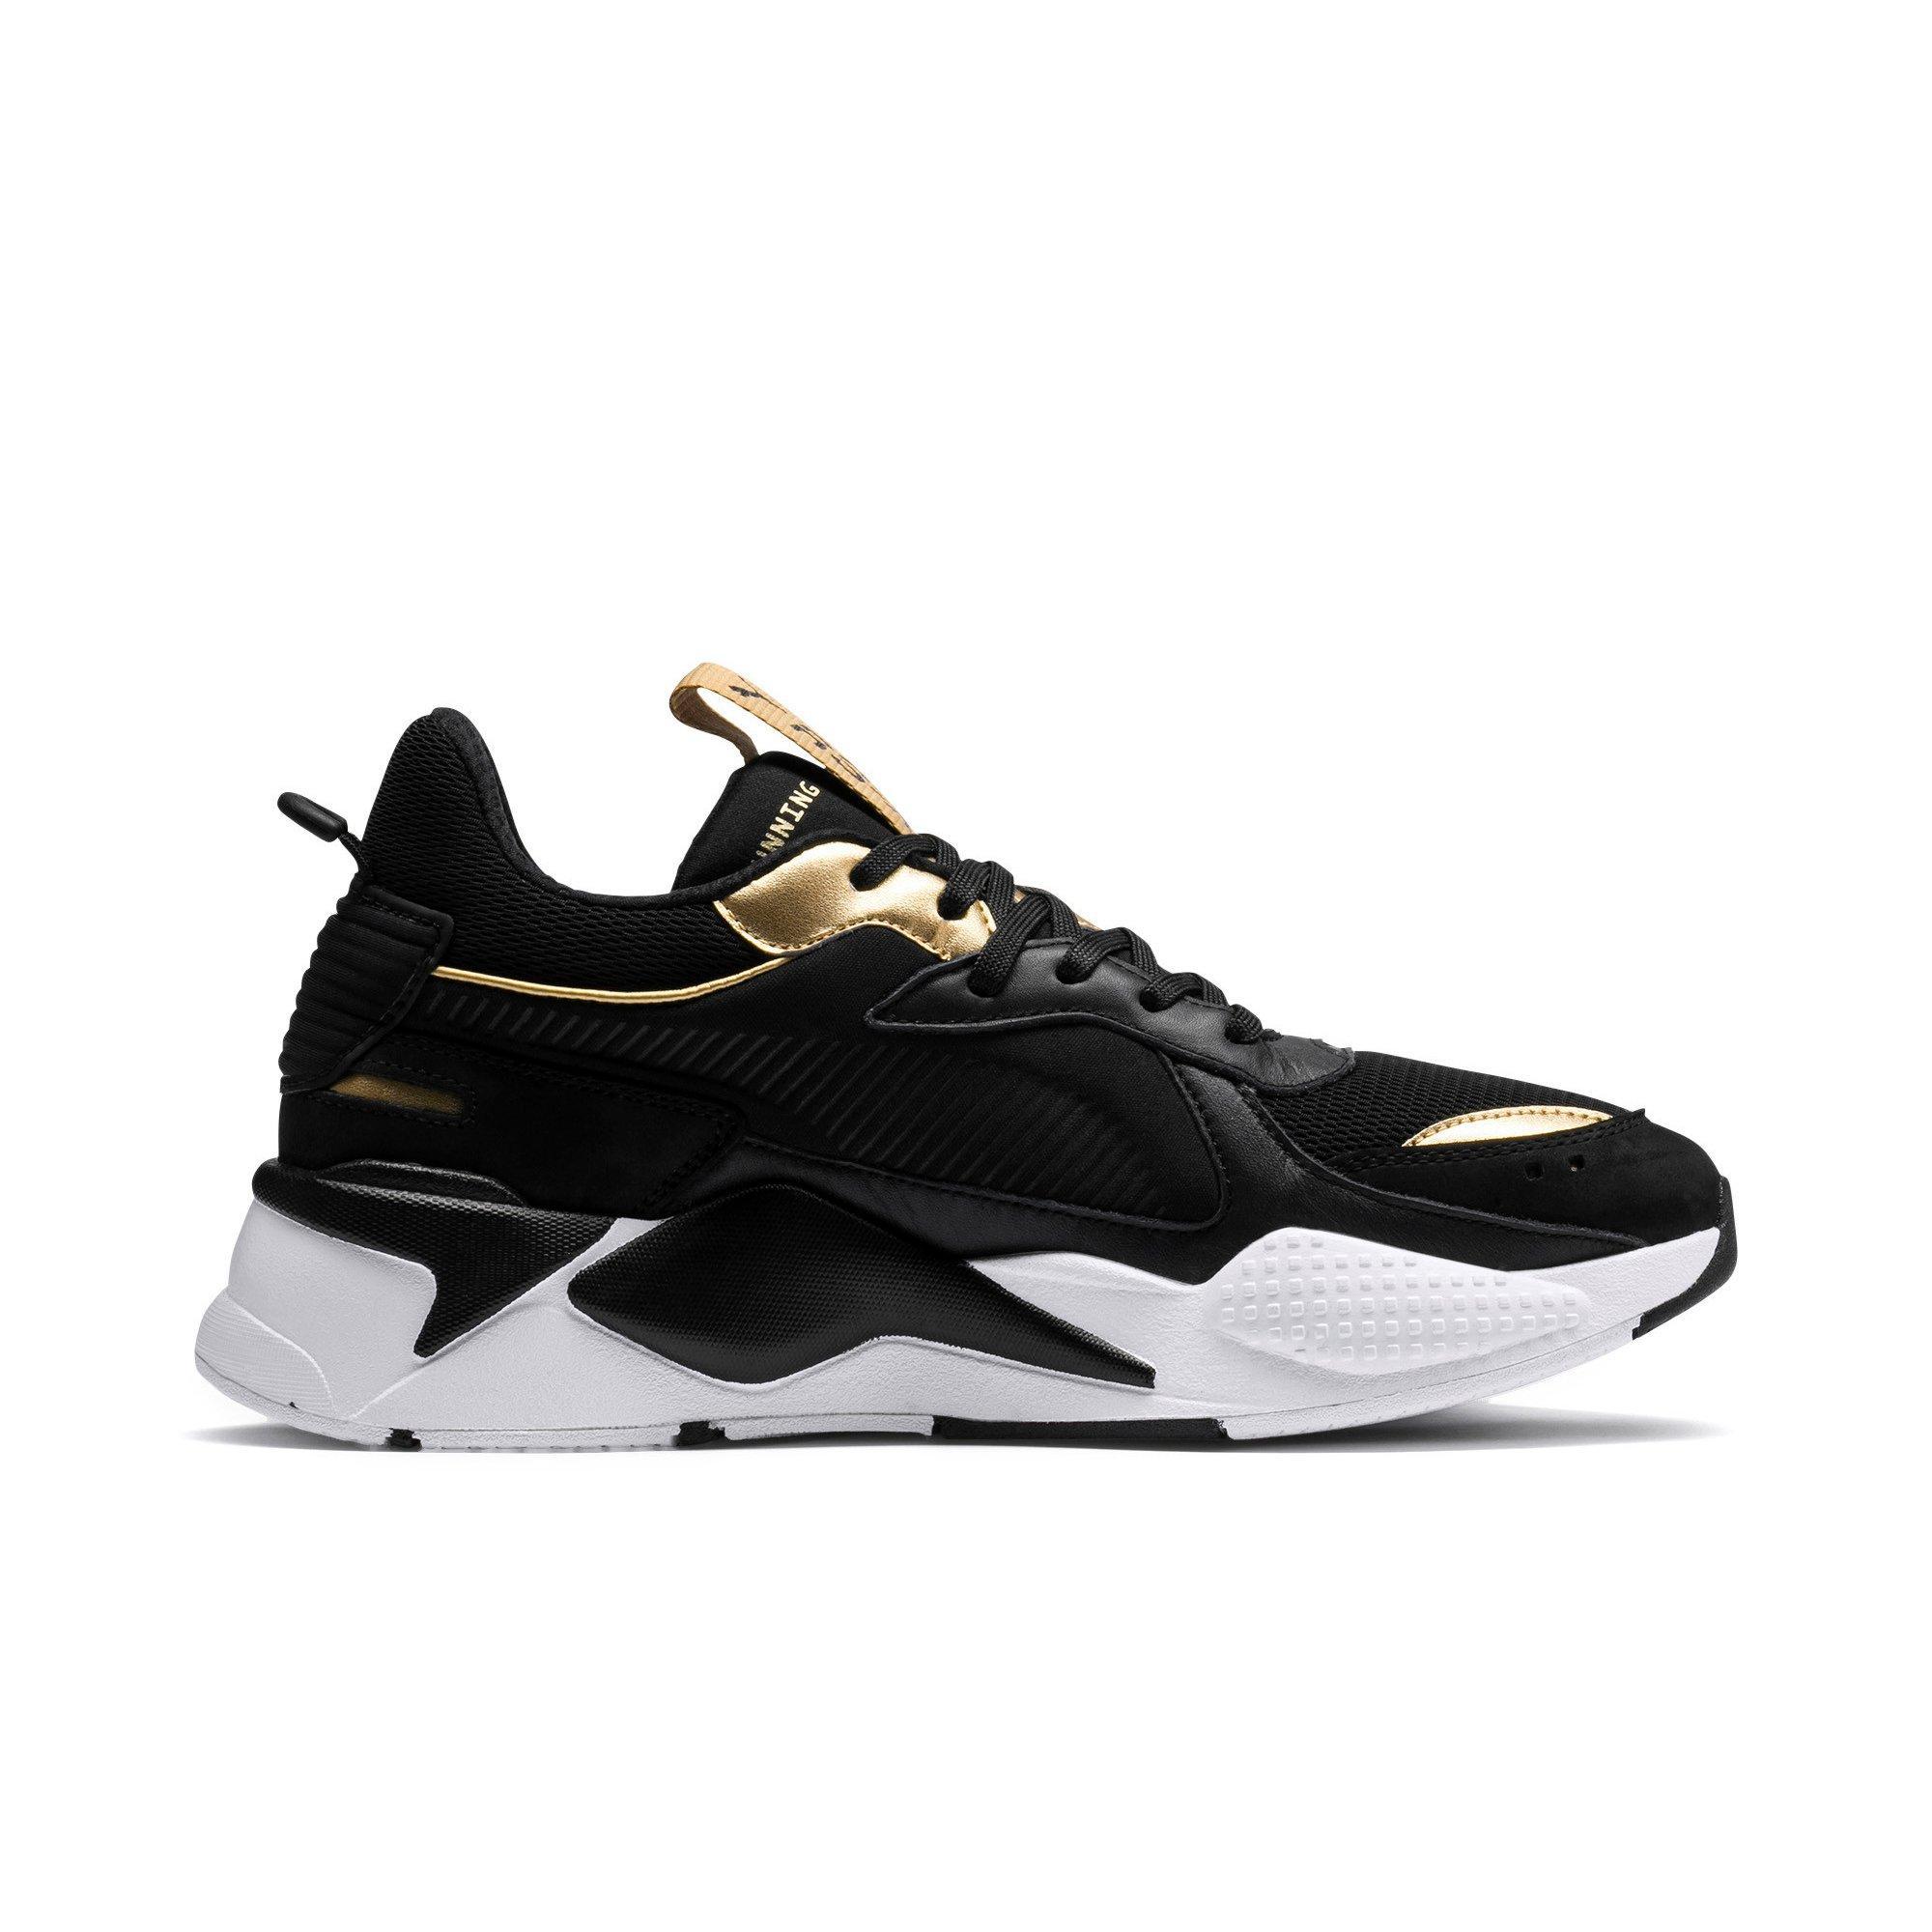 300cd9660cbc2 puma sneaker mens shoes   ventes flash